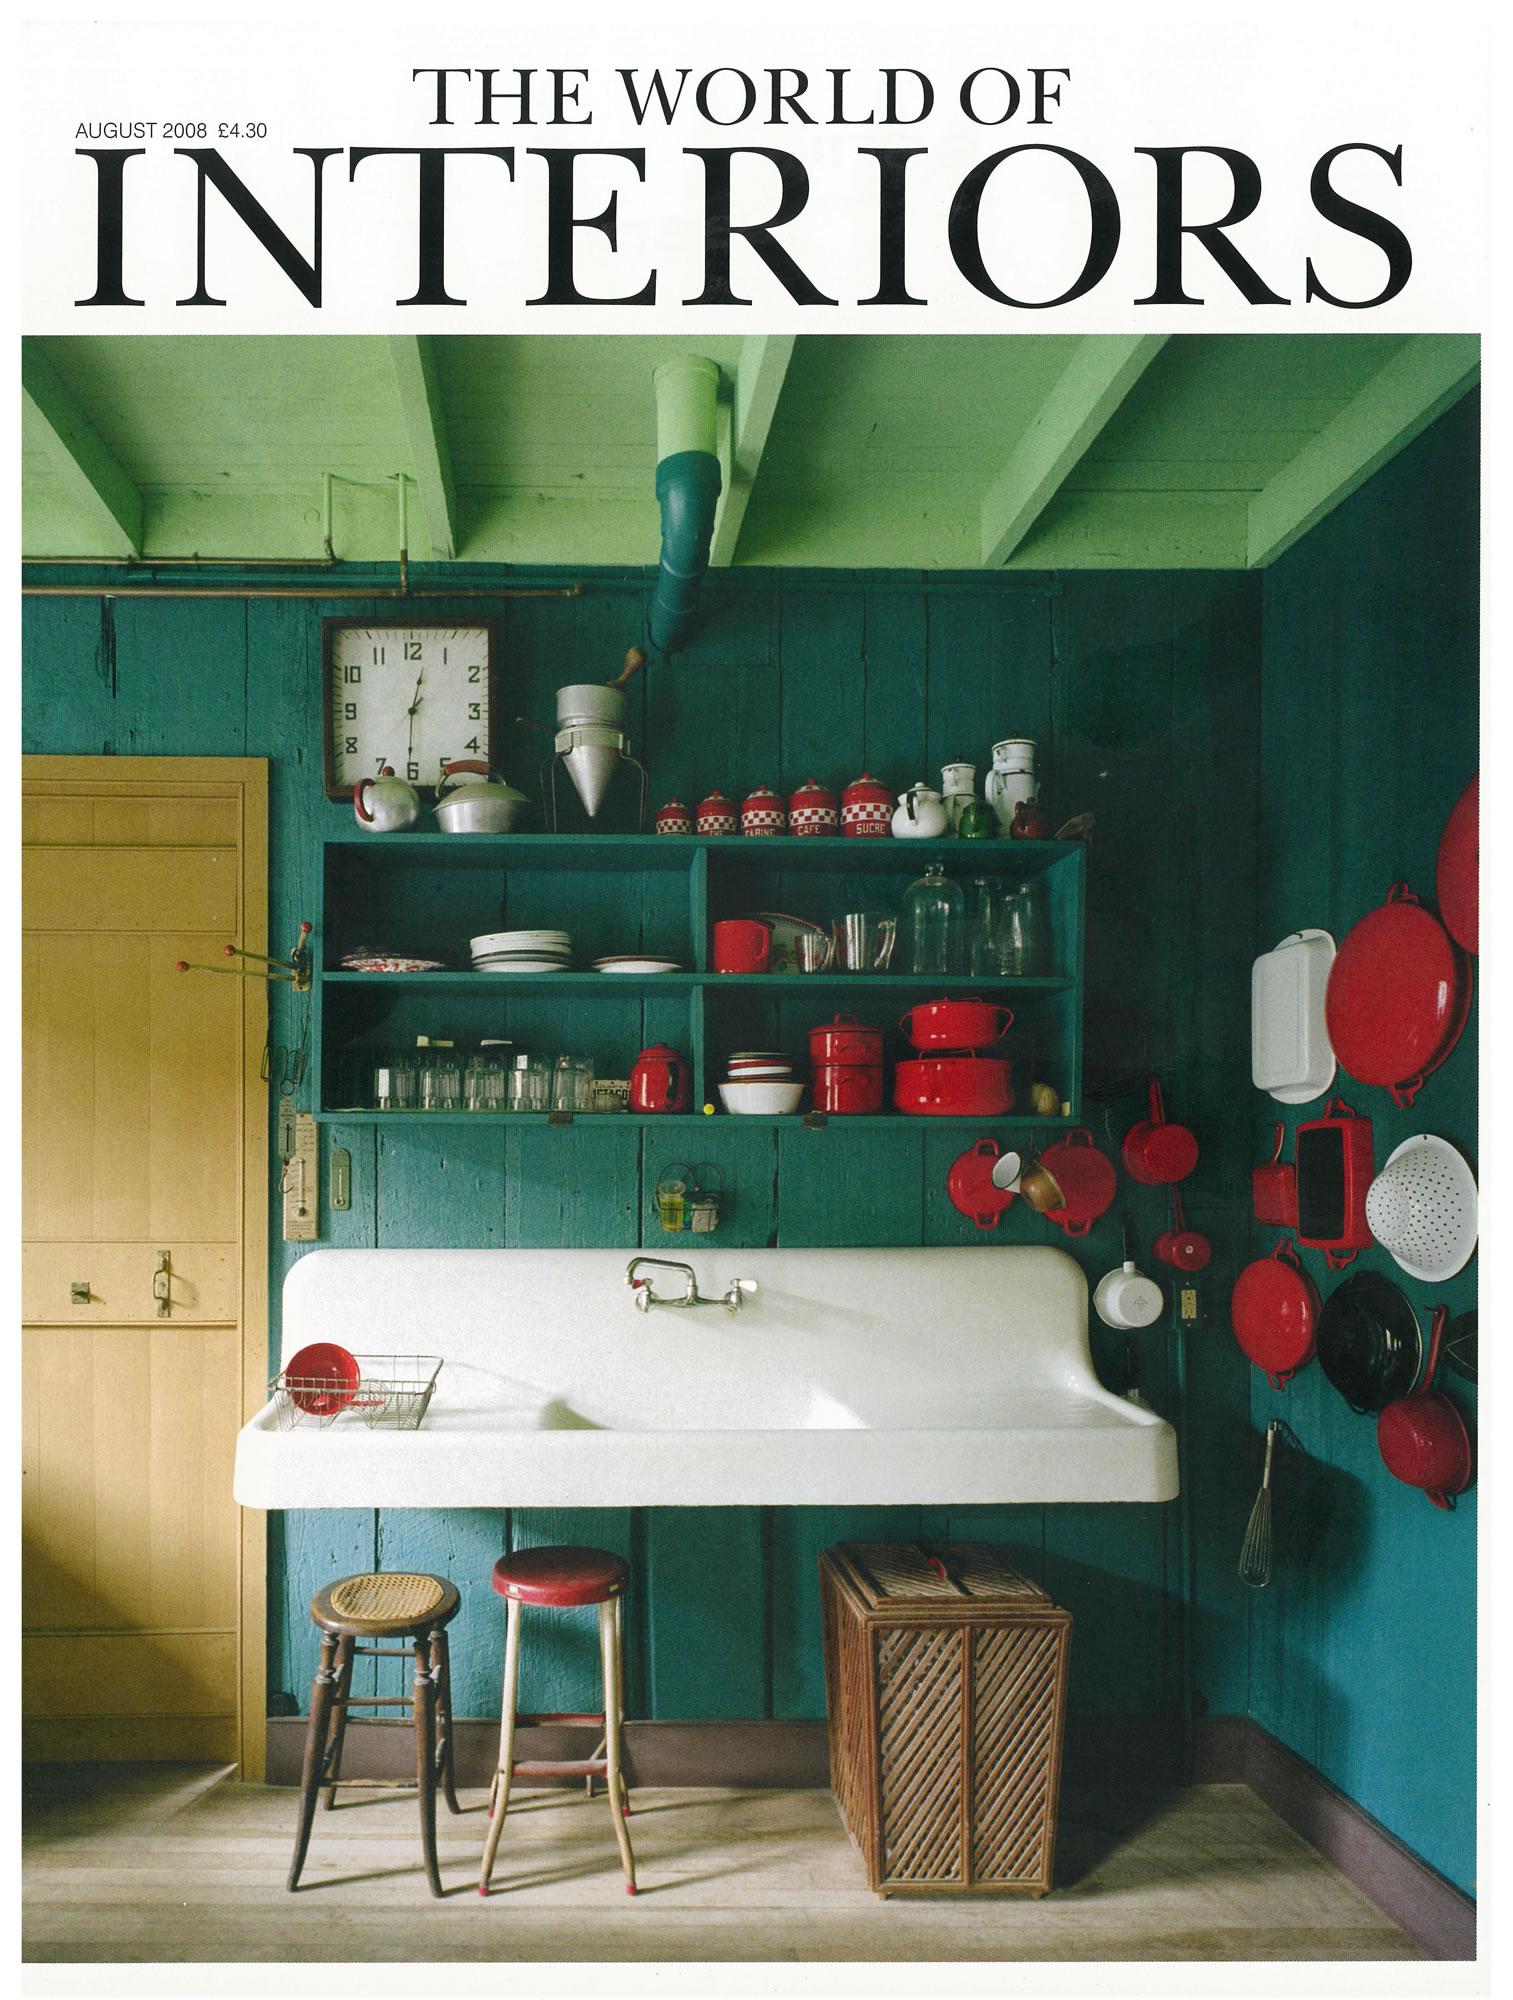 World_Of_Interiors-_August_2008_-_FP.jpg